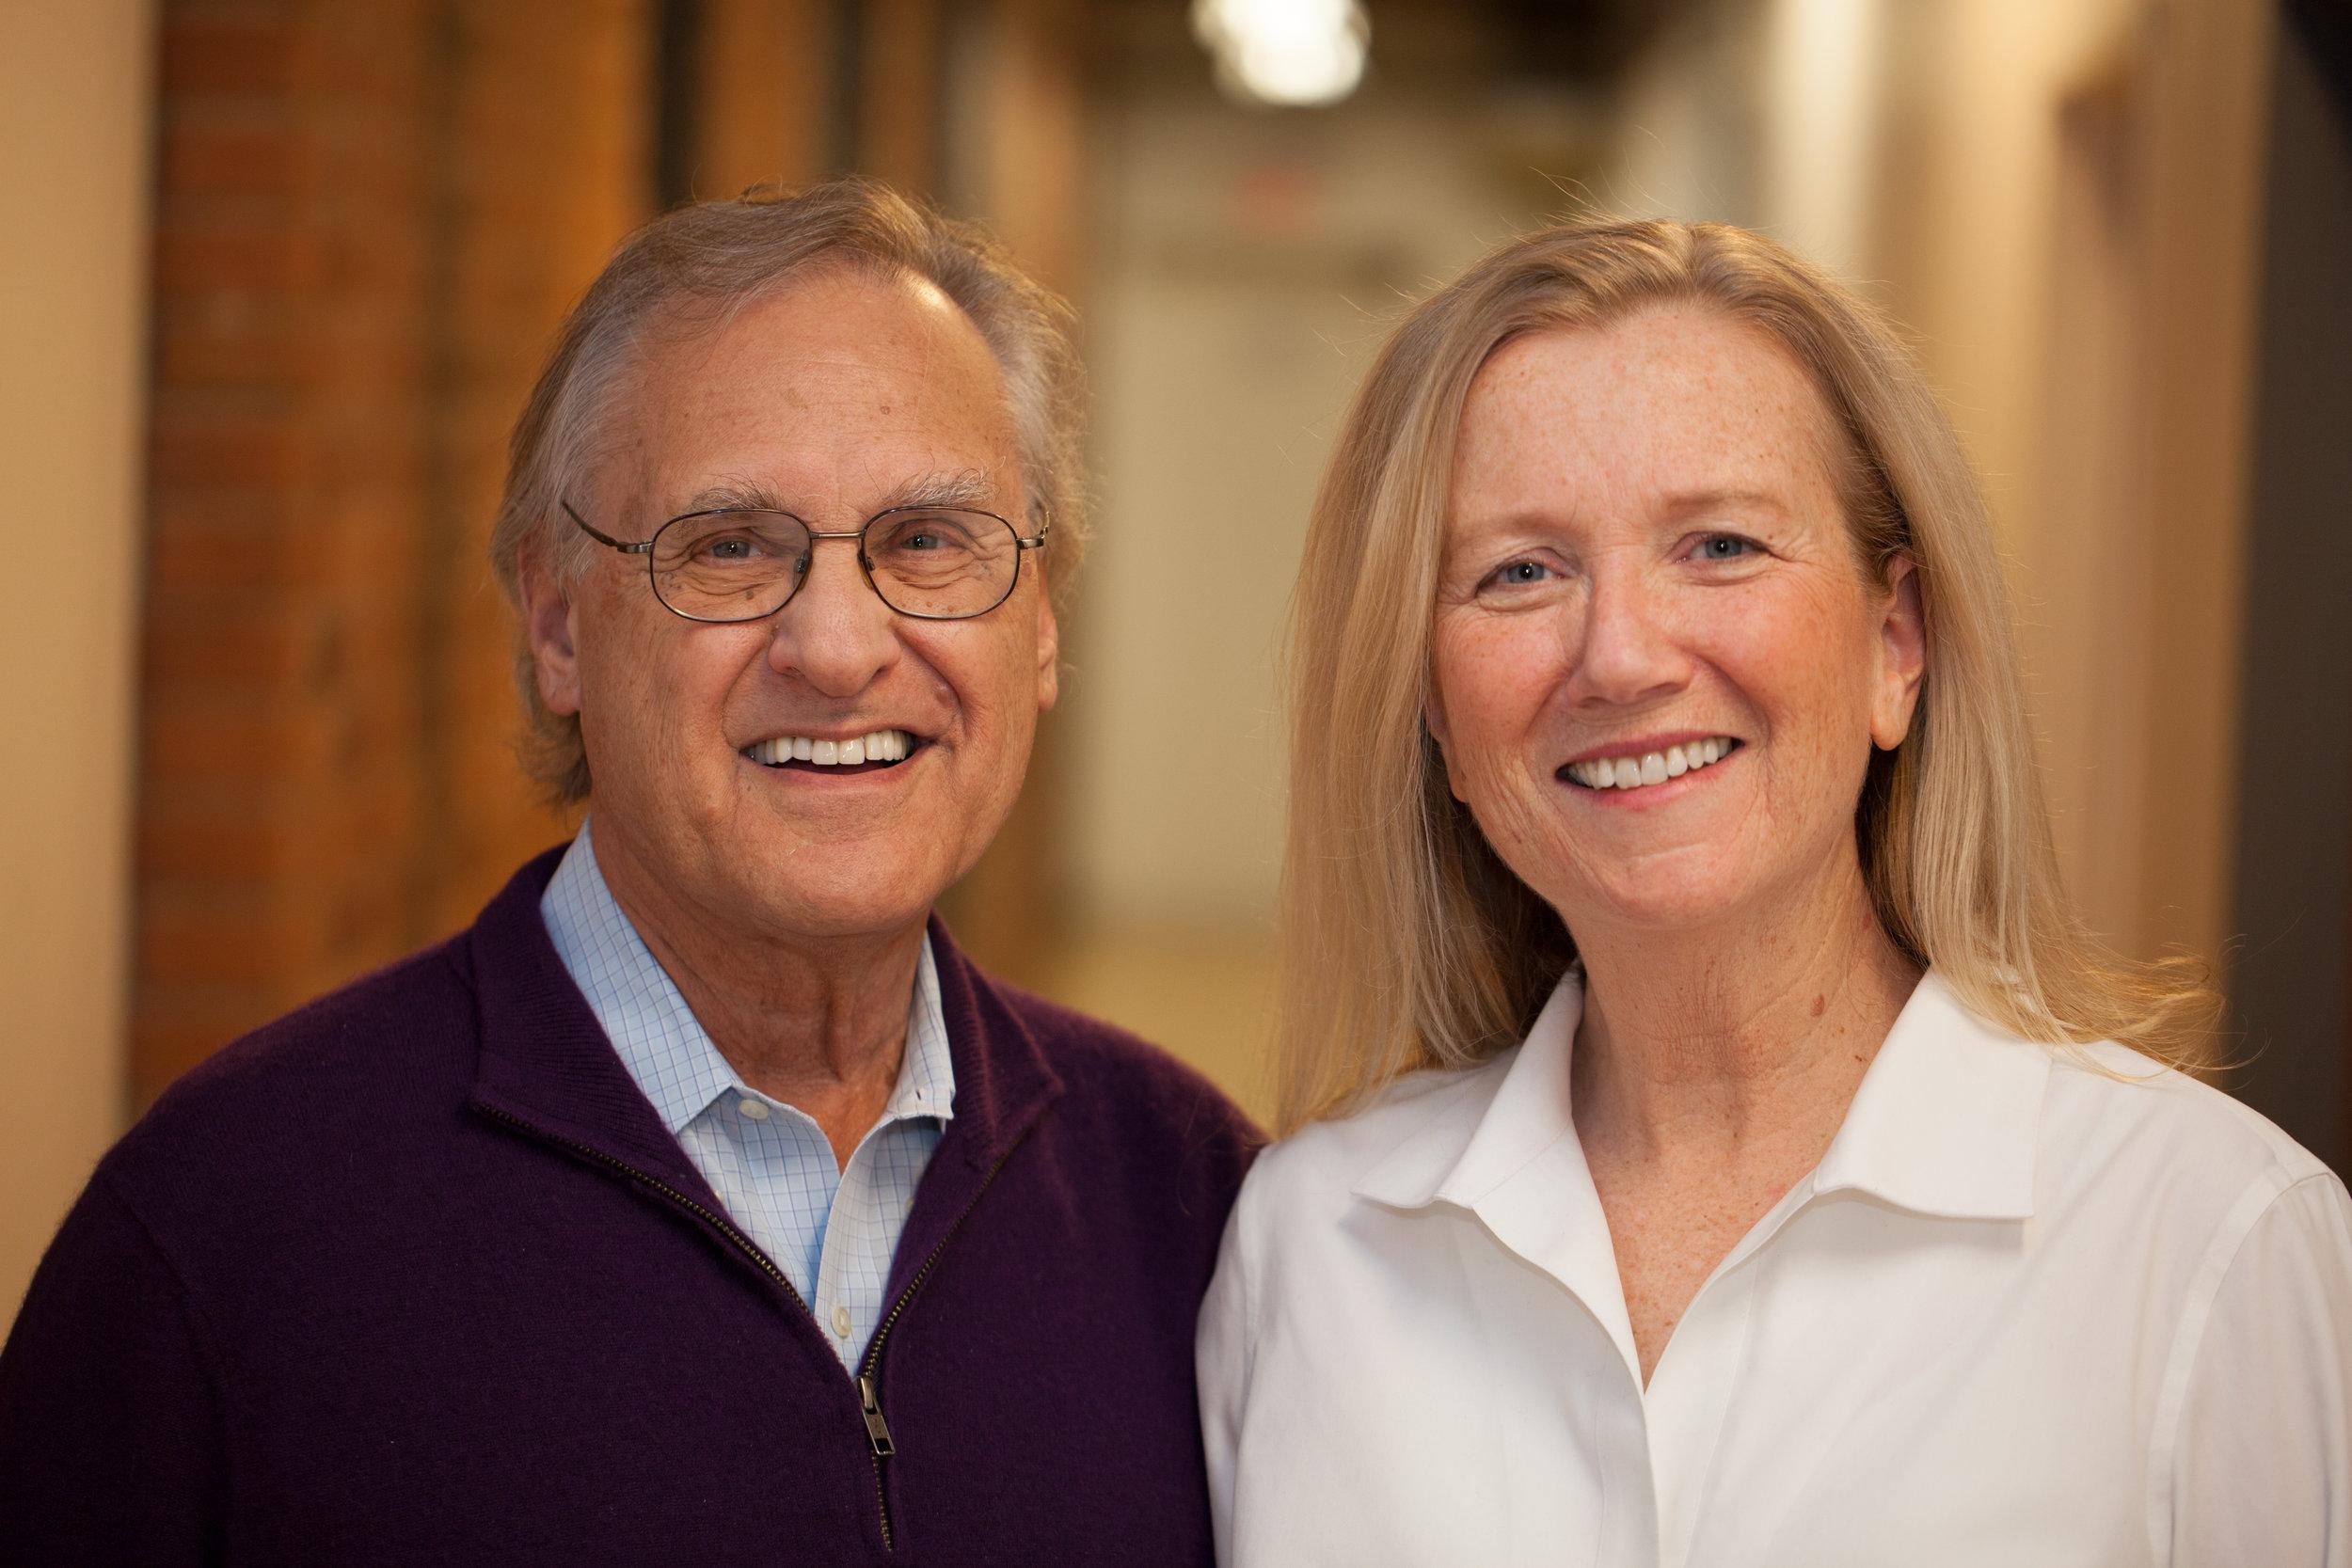 Stephen Lewis and Paula Donovan. Photo by Alexis MacDonald.